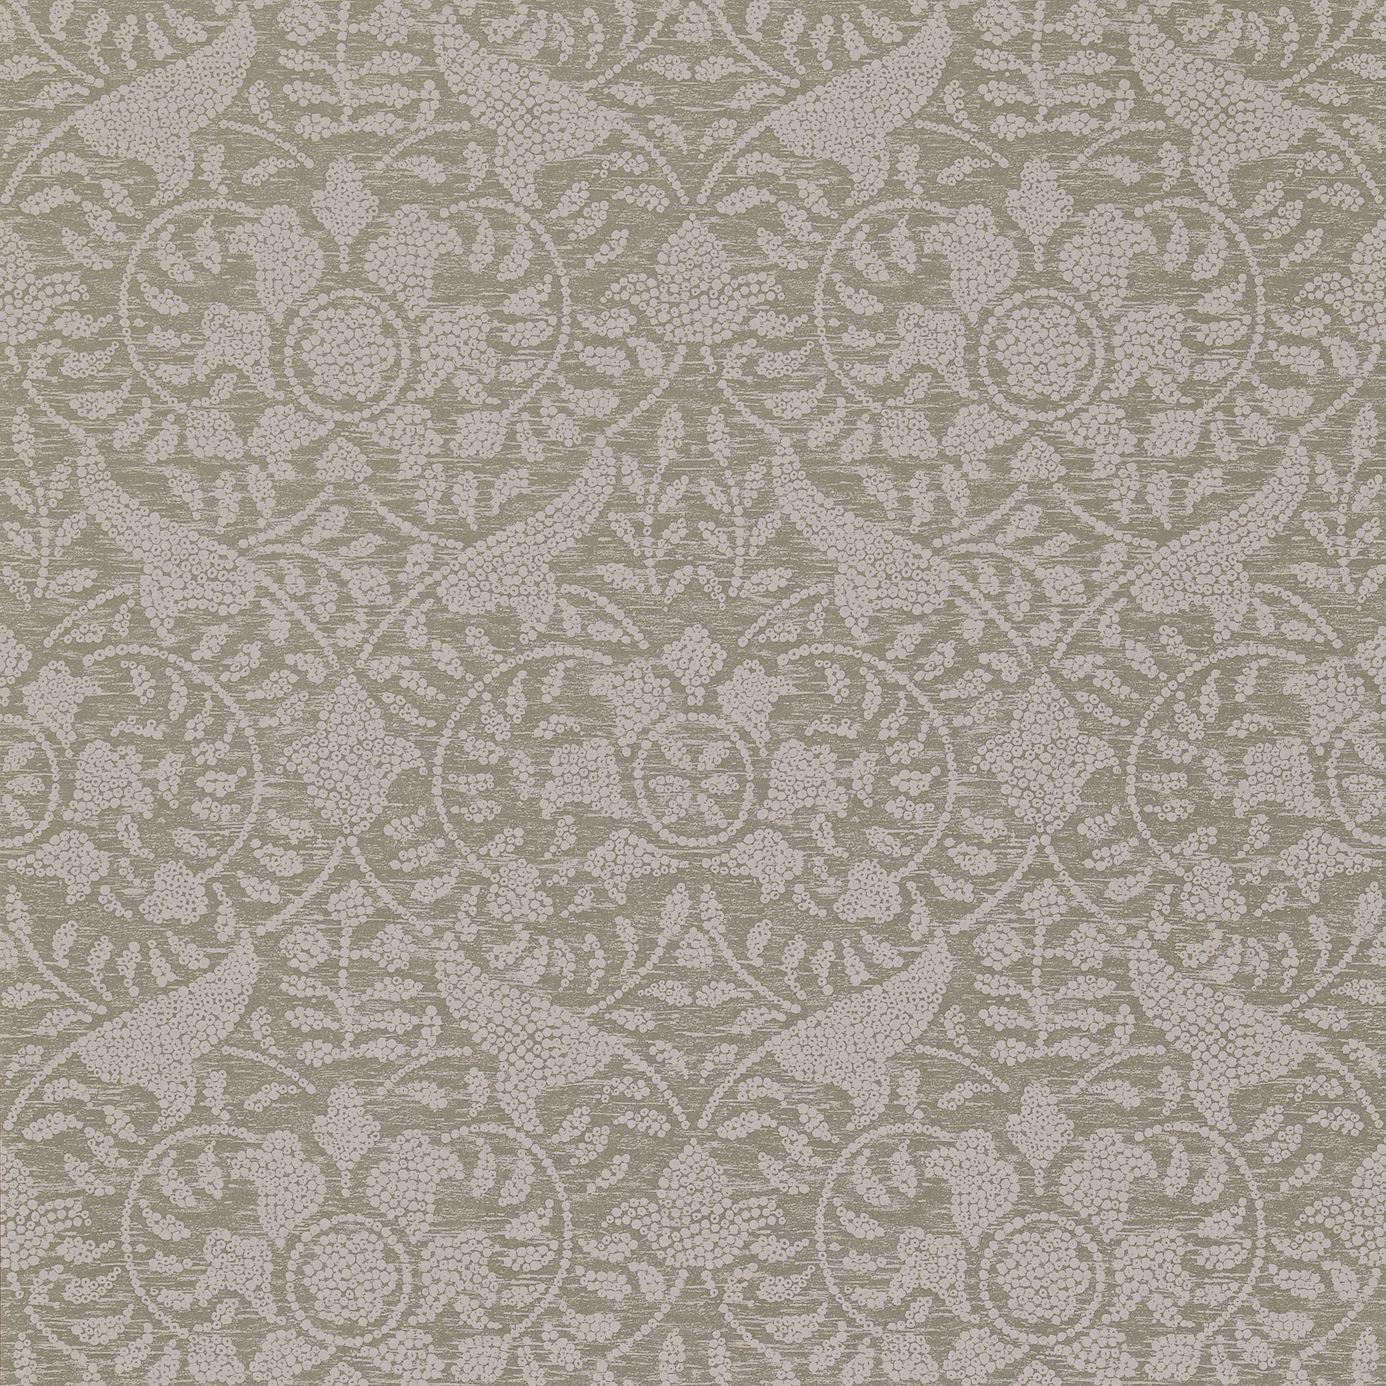 Home Wallpapers Harlequin Lalika Wallpapers Azita Wallpaper   Silver 1386x1386